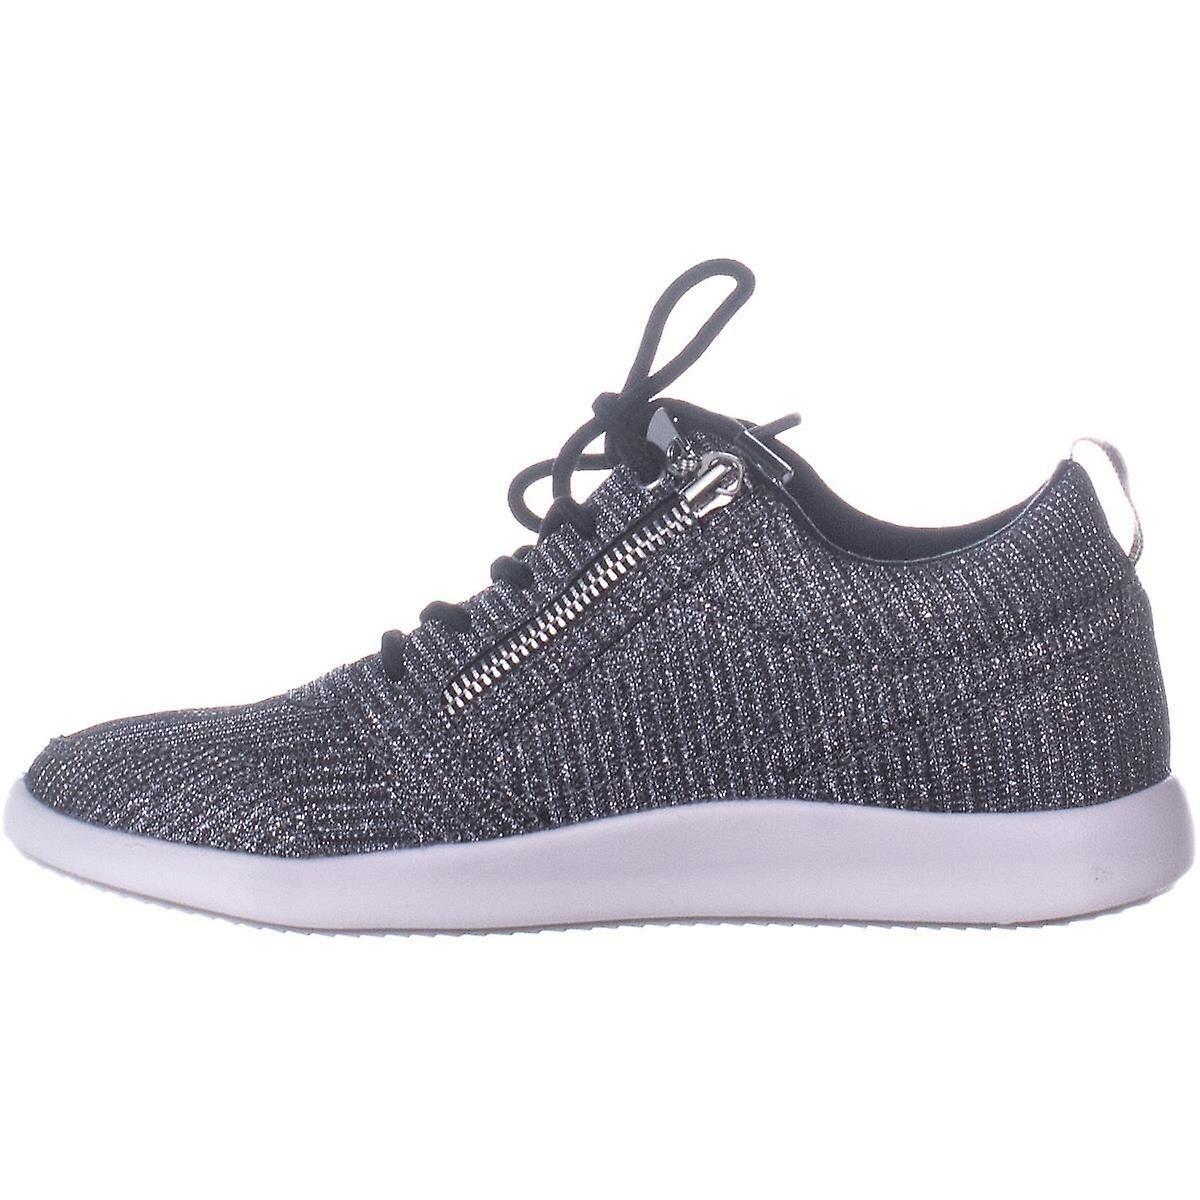 G door Guess Womens Blazin Fabric Low Top Lace Up Fashion Sneakers - Gratis verzending svo5r6